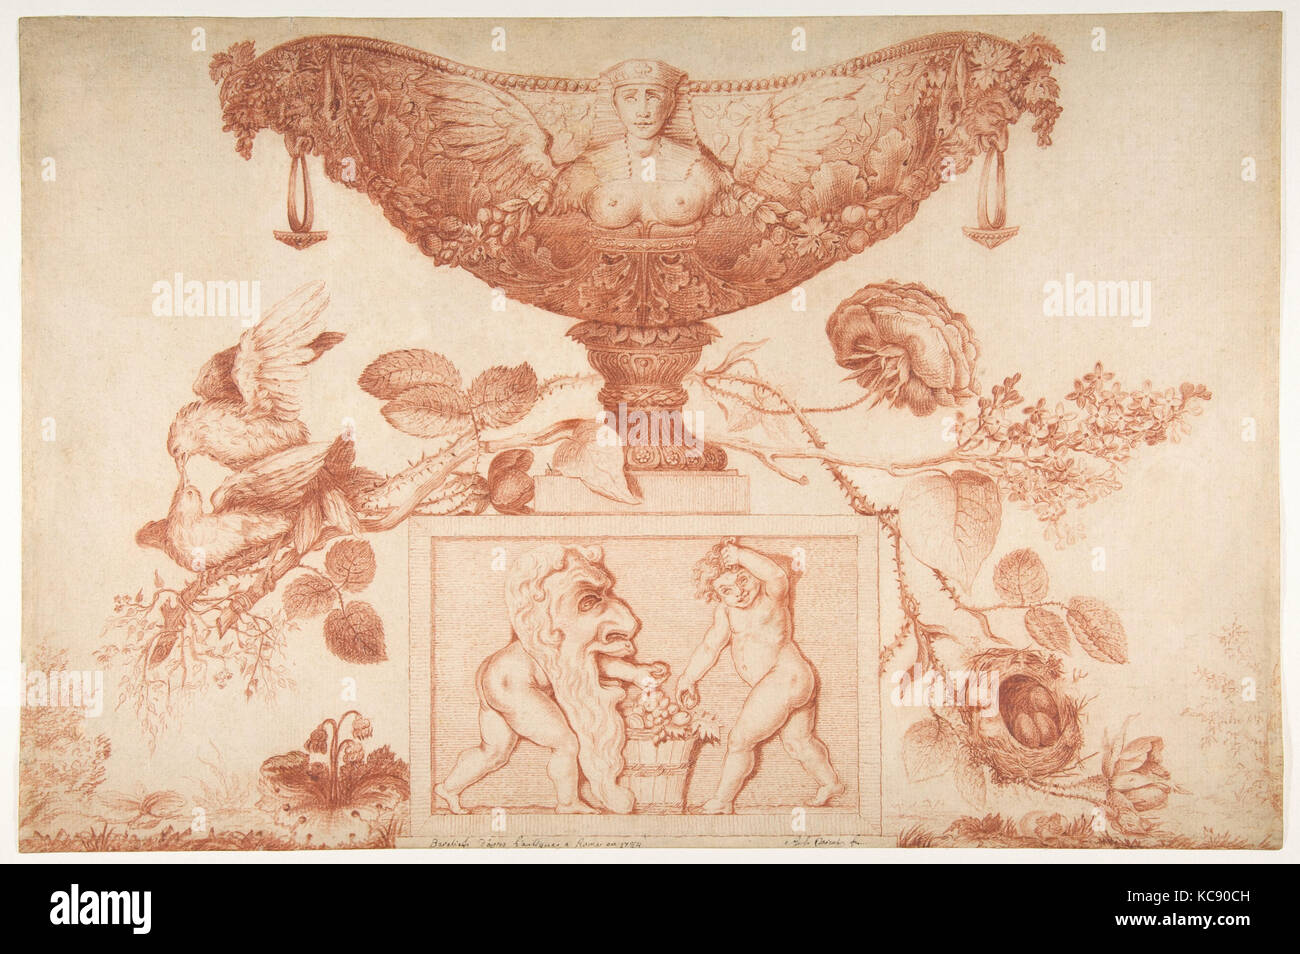 Wine Cooler or Vase on a Classical Pedestal, Aubert Henri Joseph Parent, ca. 1784 - Stock Image